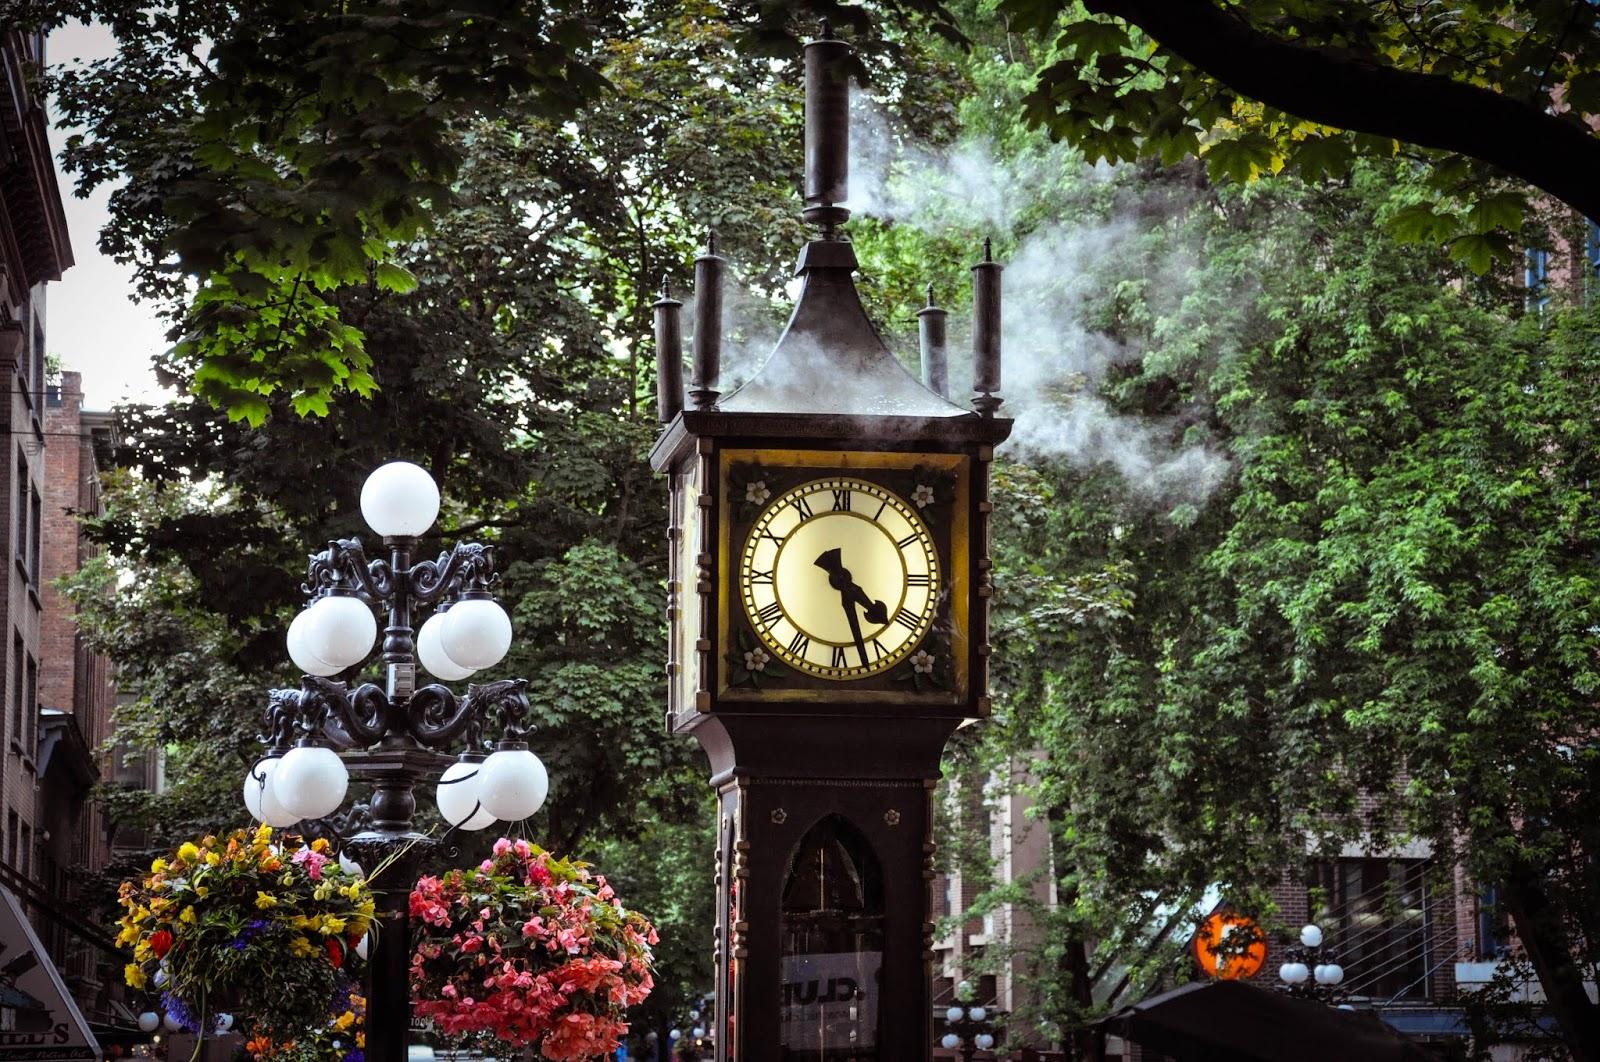 Vancouver Gastown, Old Clock, Canada \ Ванкувер Гастуан, старинные часы, Канада